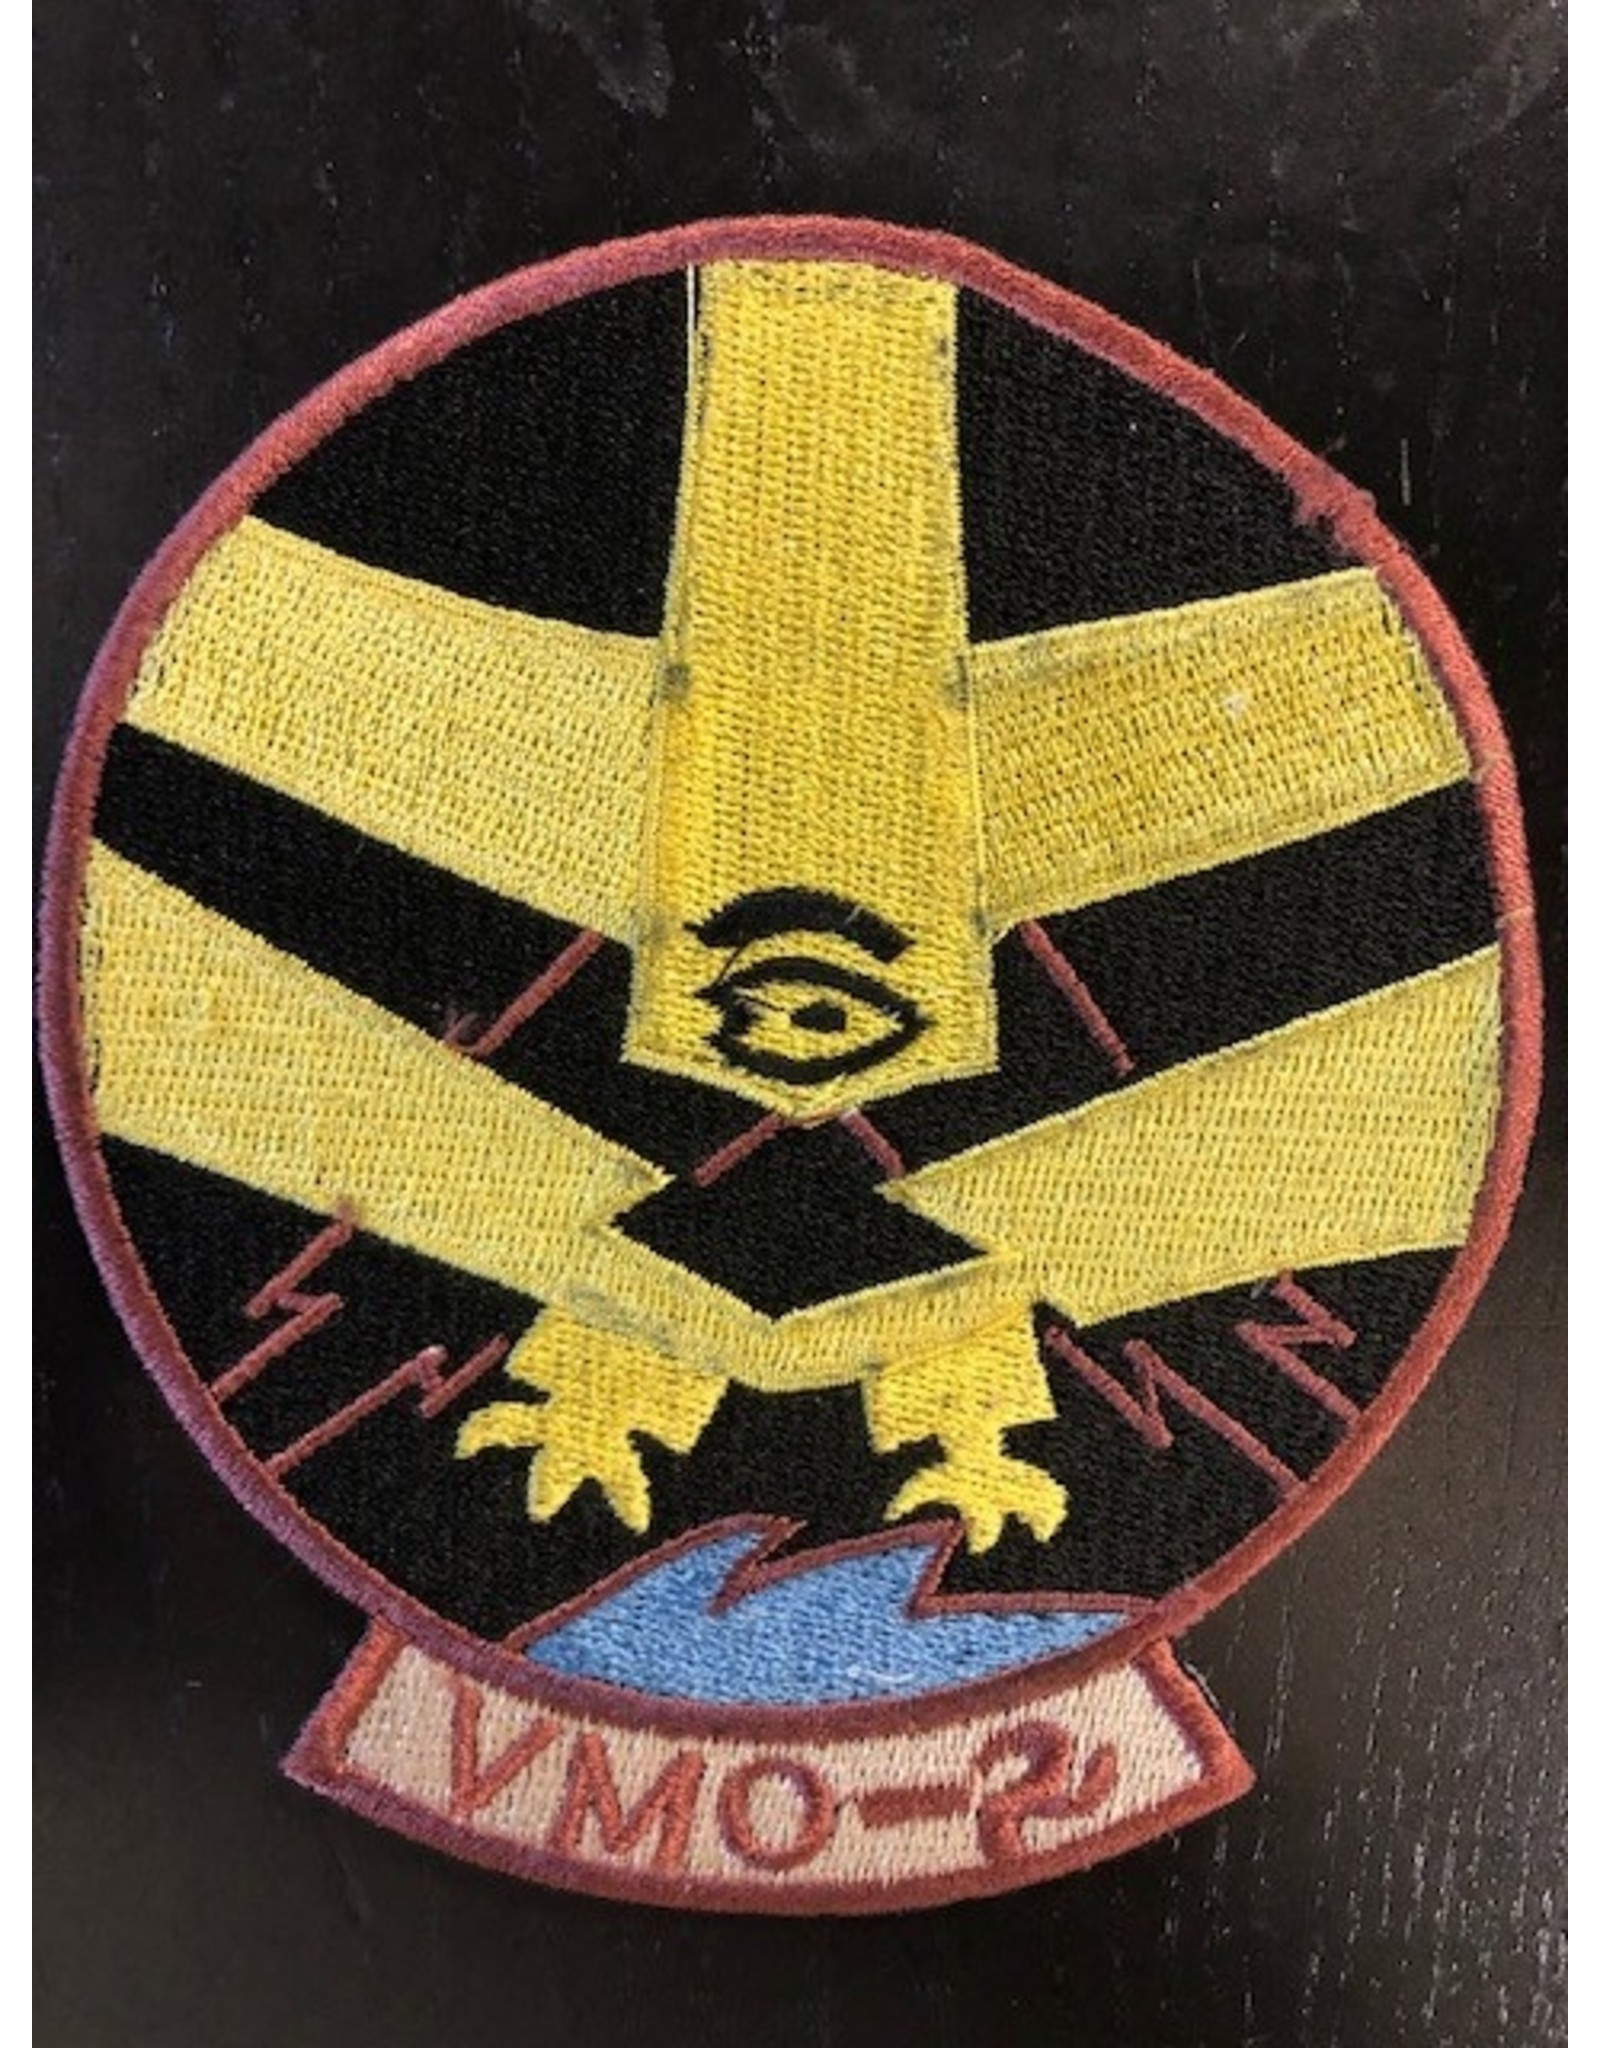 FWAM VMO-2 Eyes of Death (21), patch